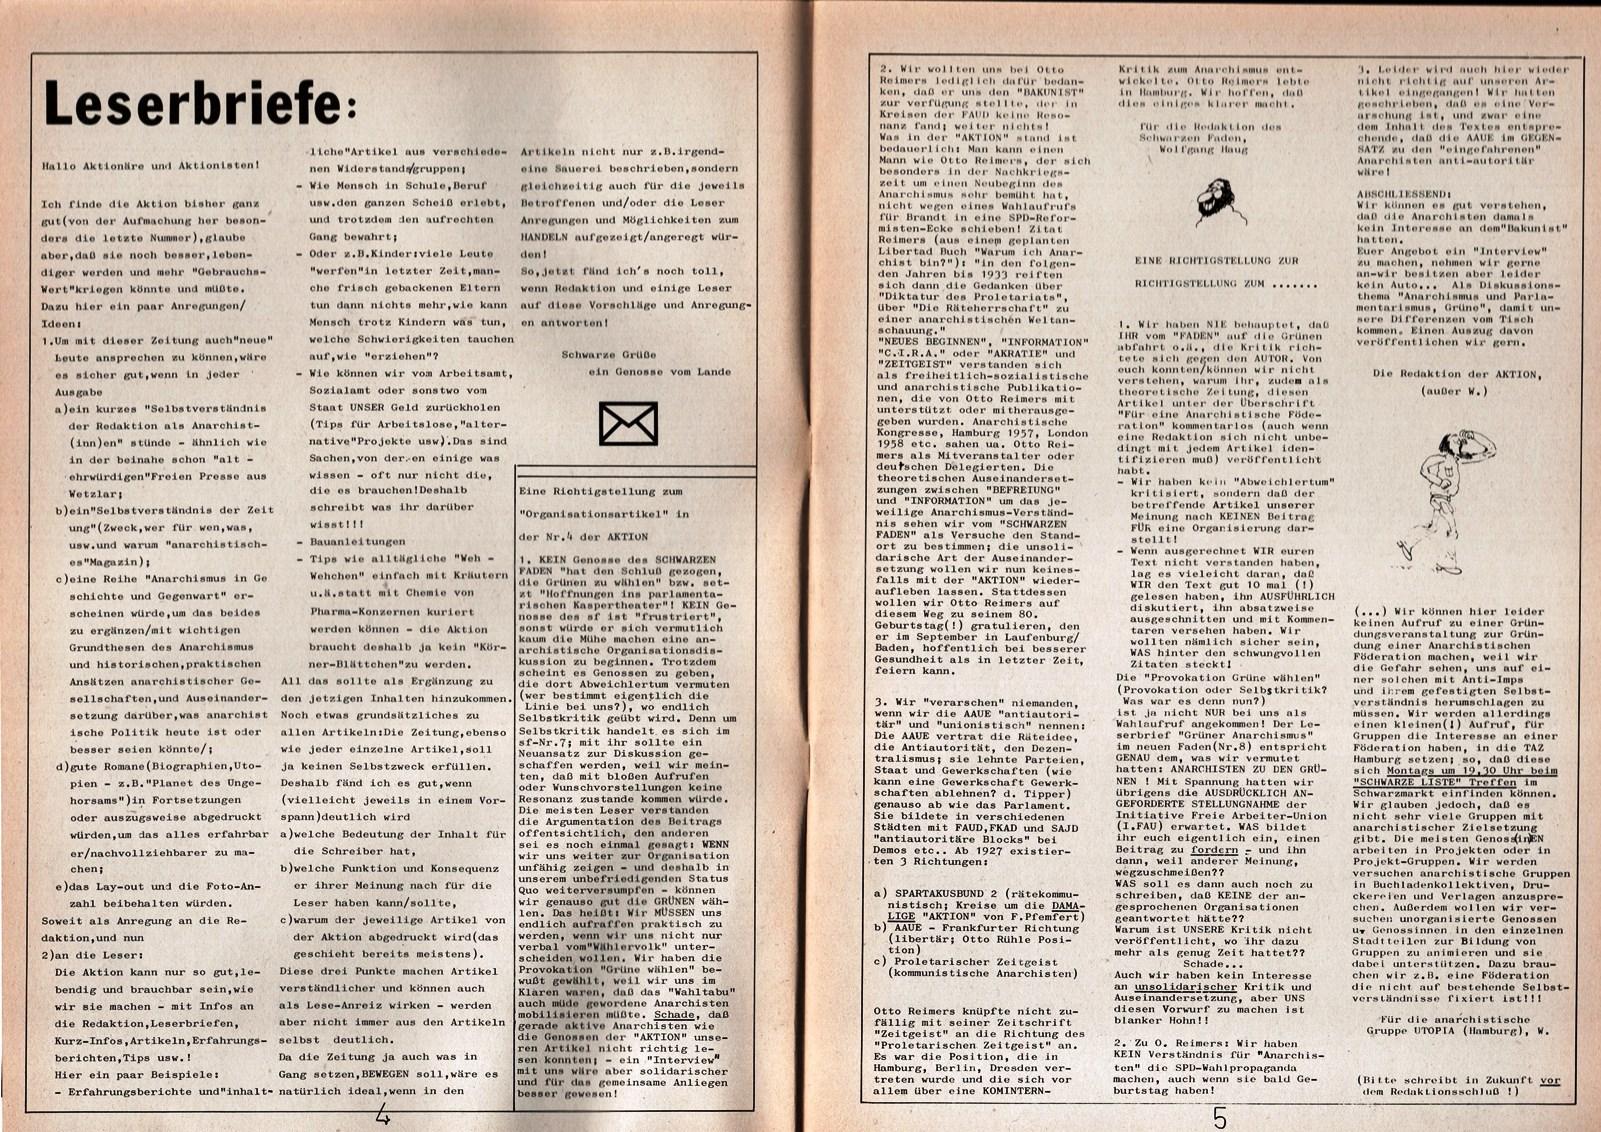 Frankfurt_Aktion_19821000_005_003